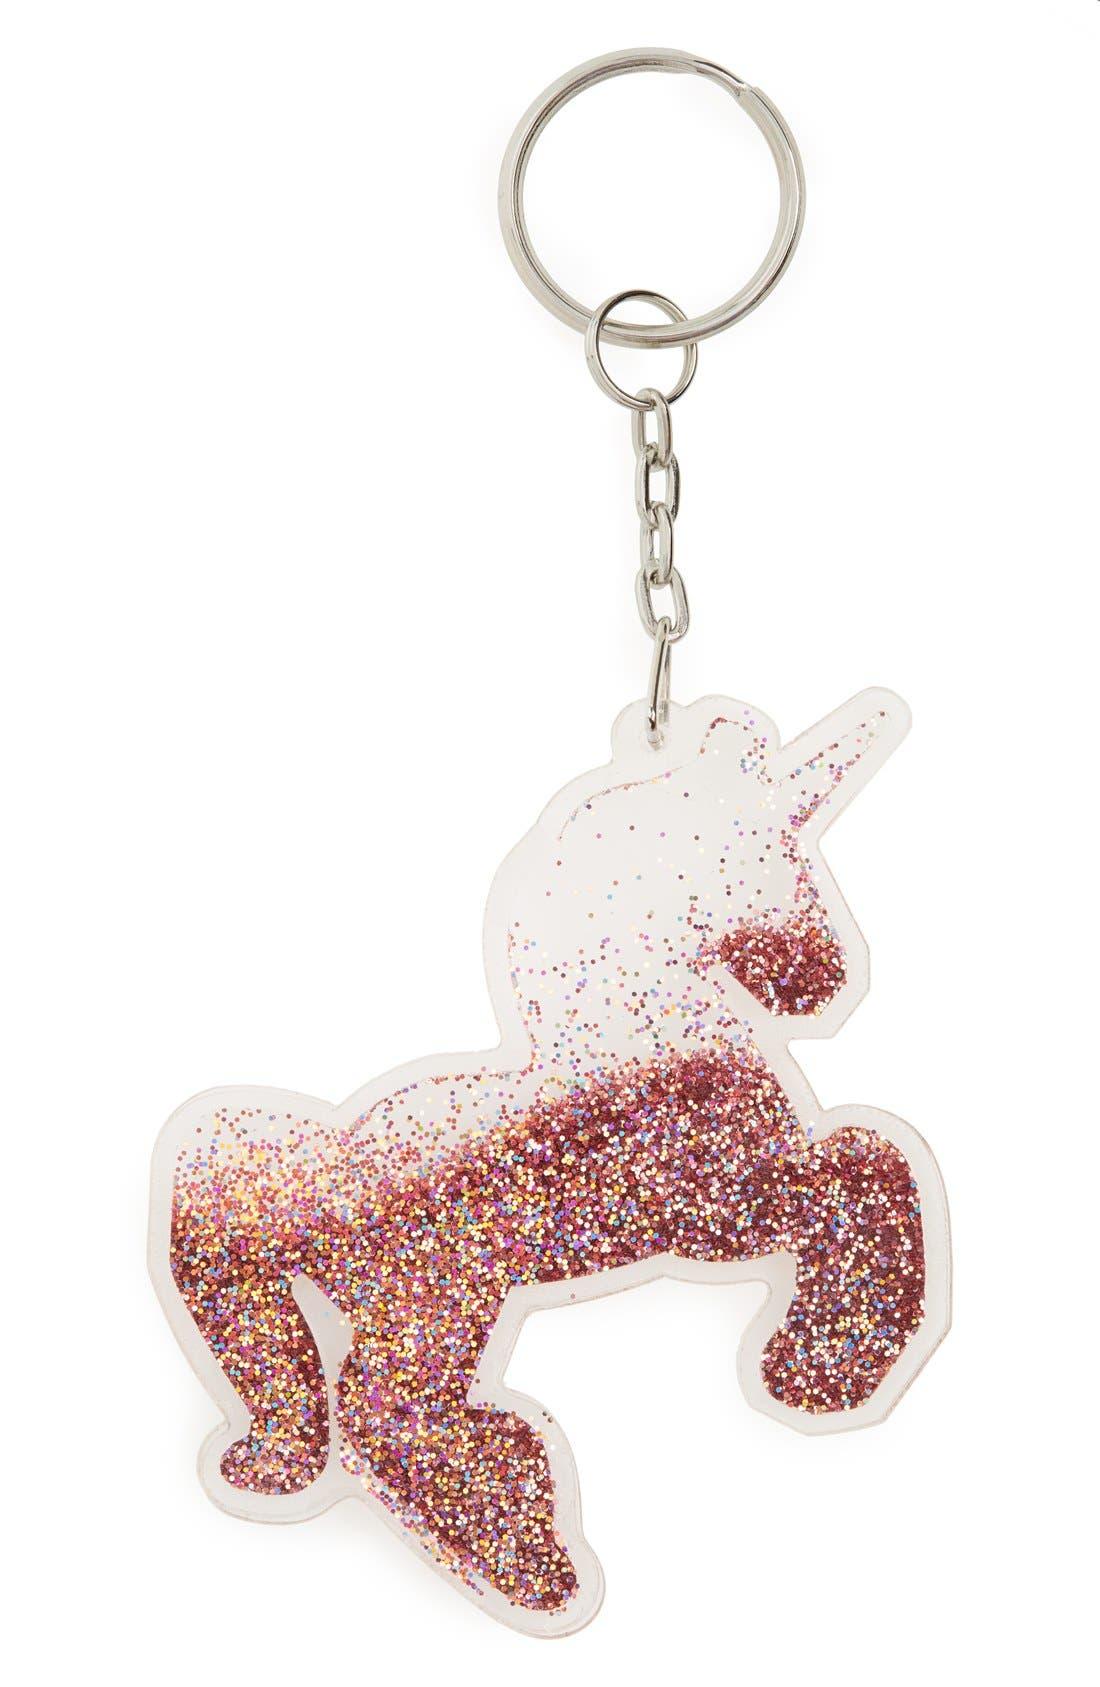 TOPSHOP Glitter Unicorn Bag Charm, Main, color, 040